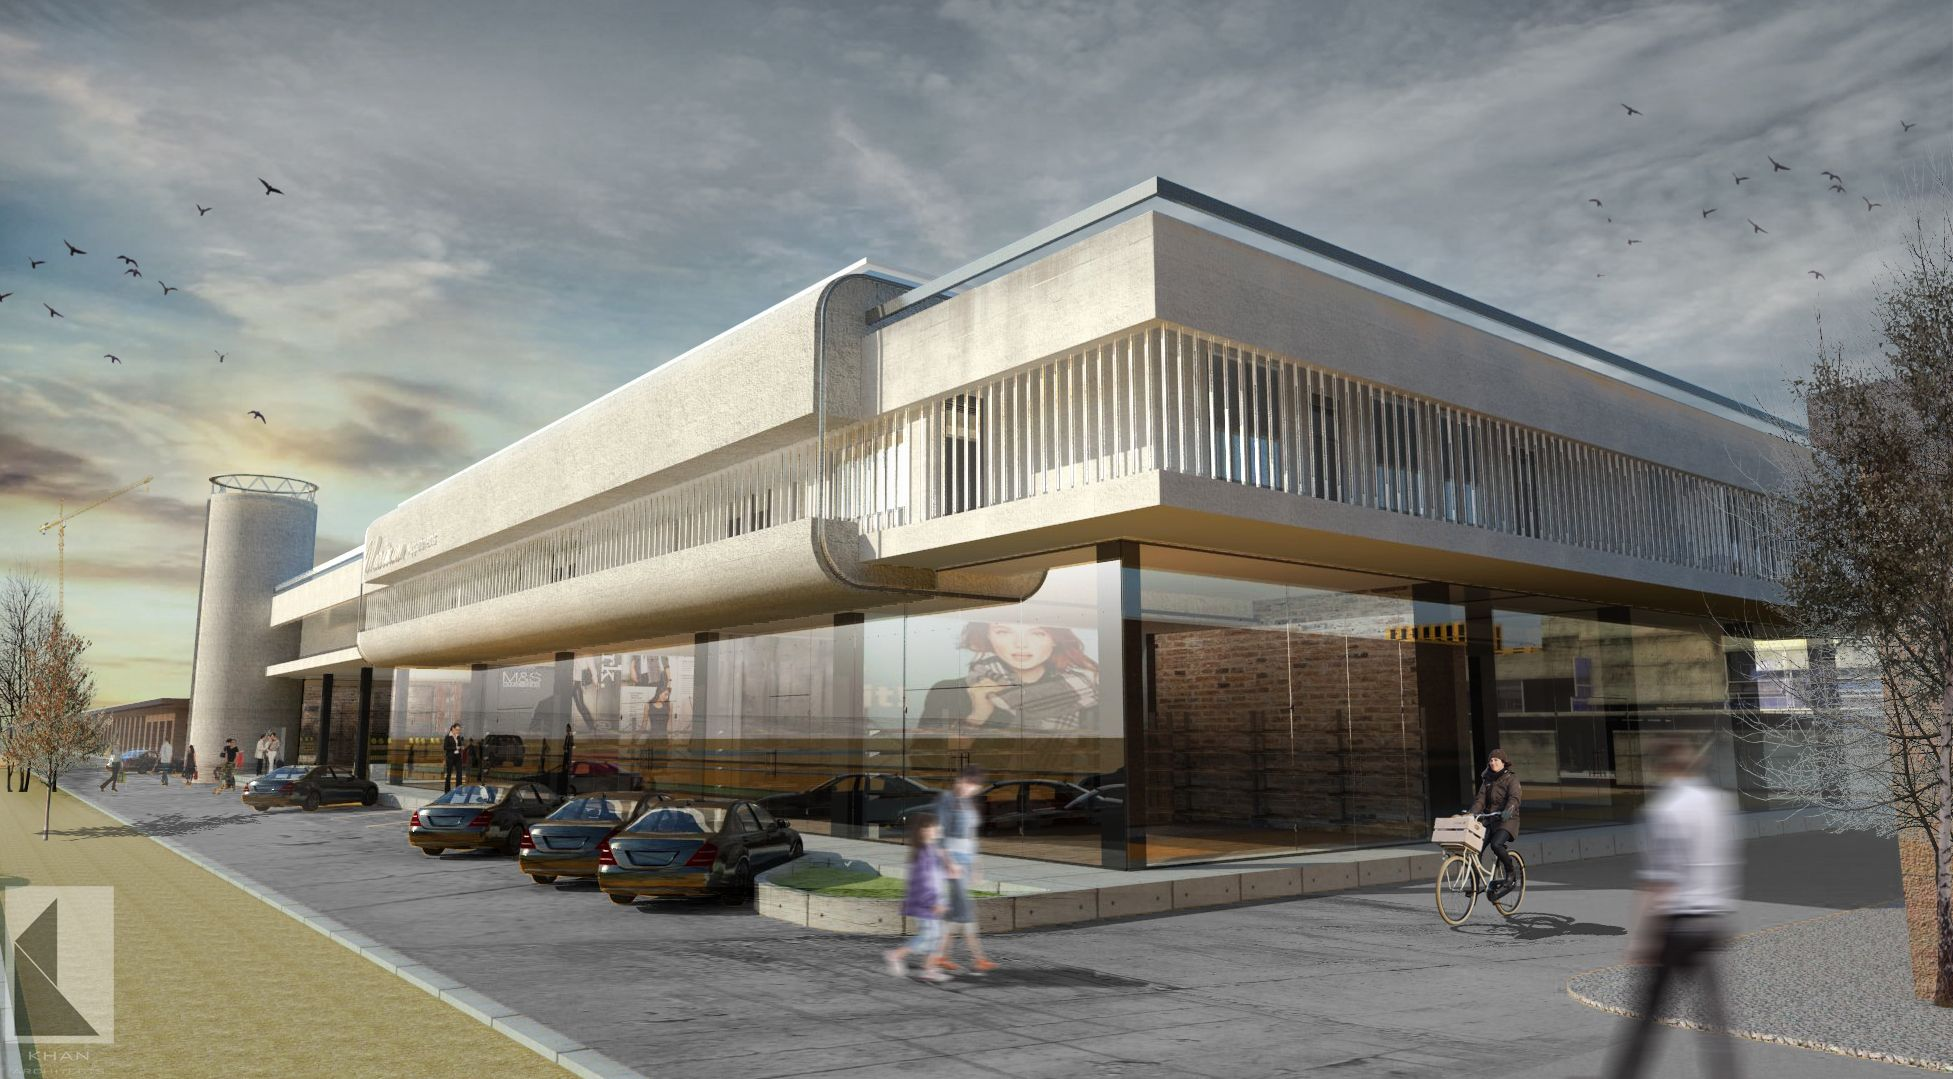 proposal design al Quds complex - kirkuk | commercial